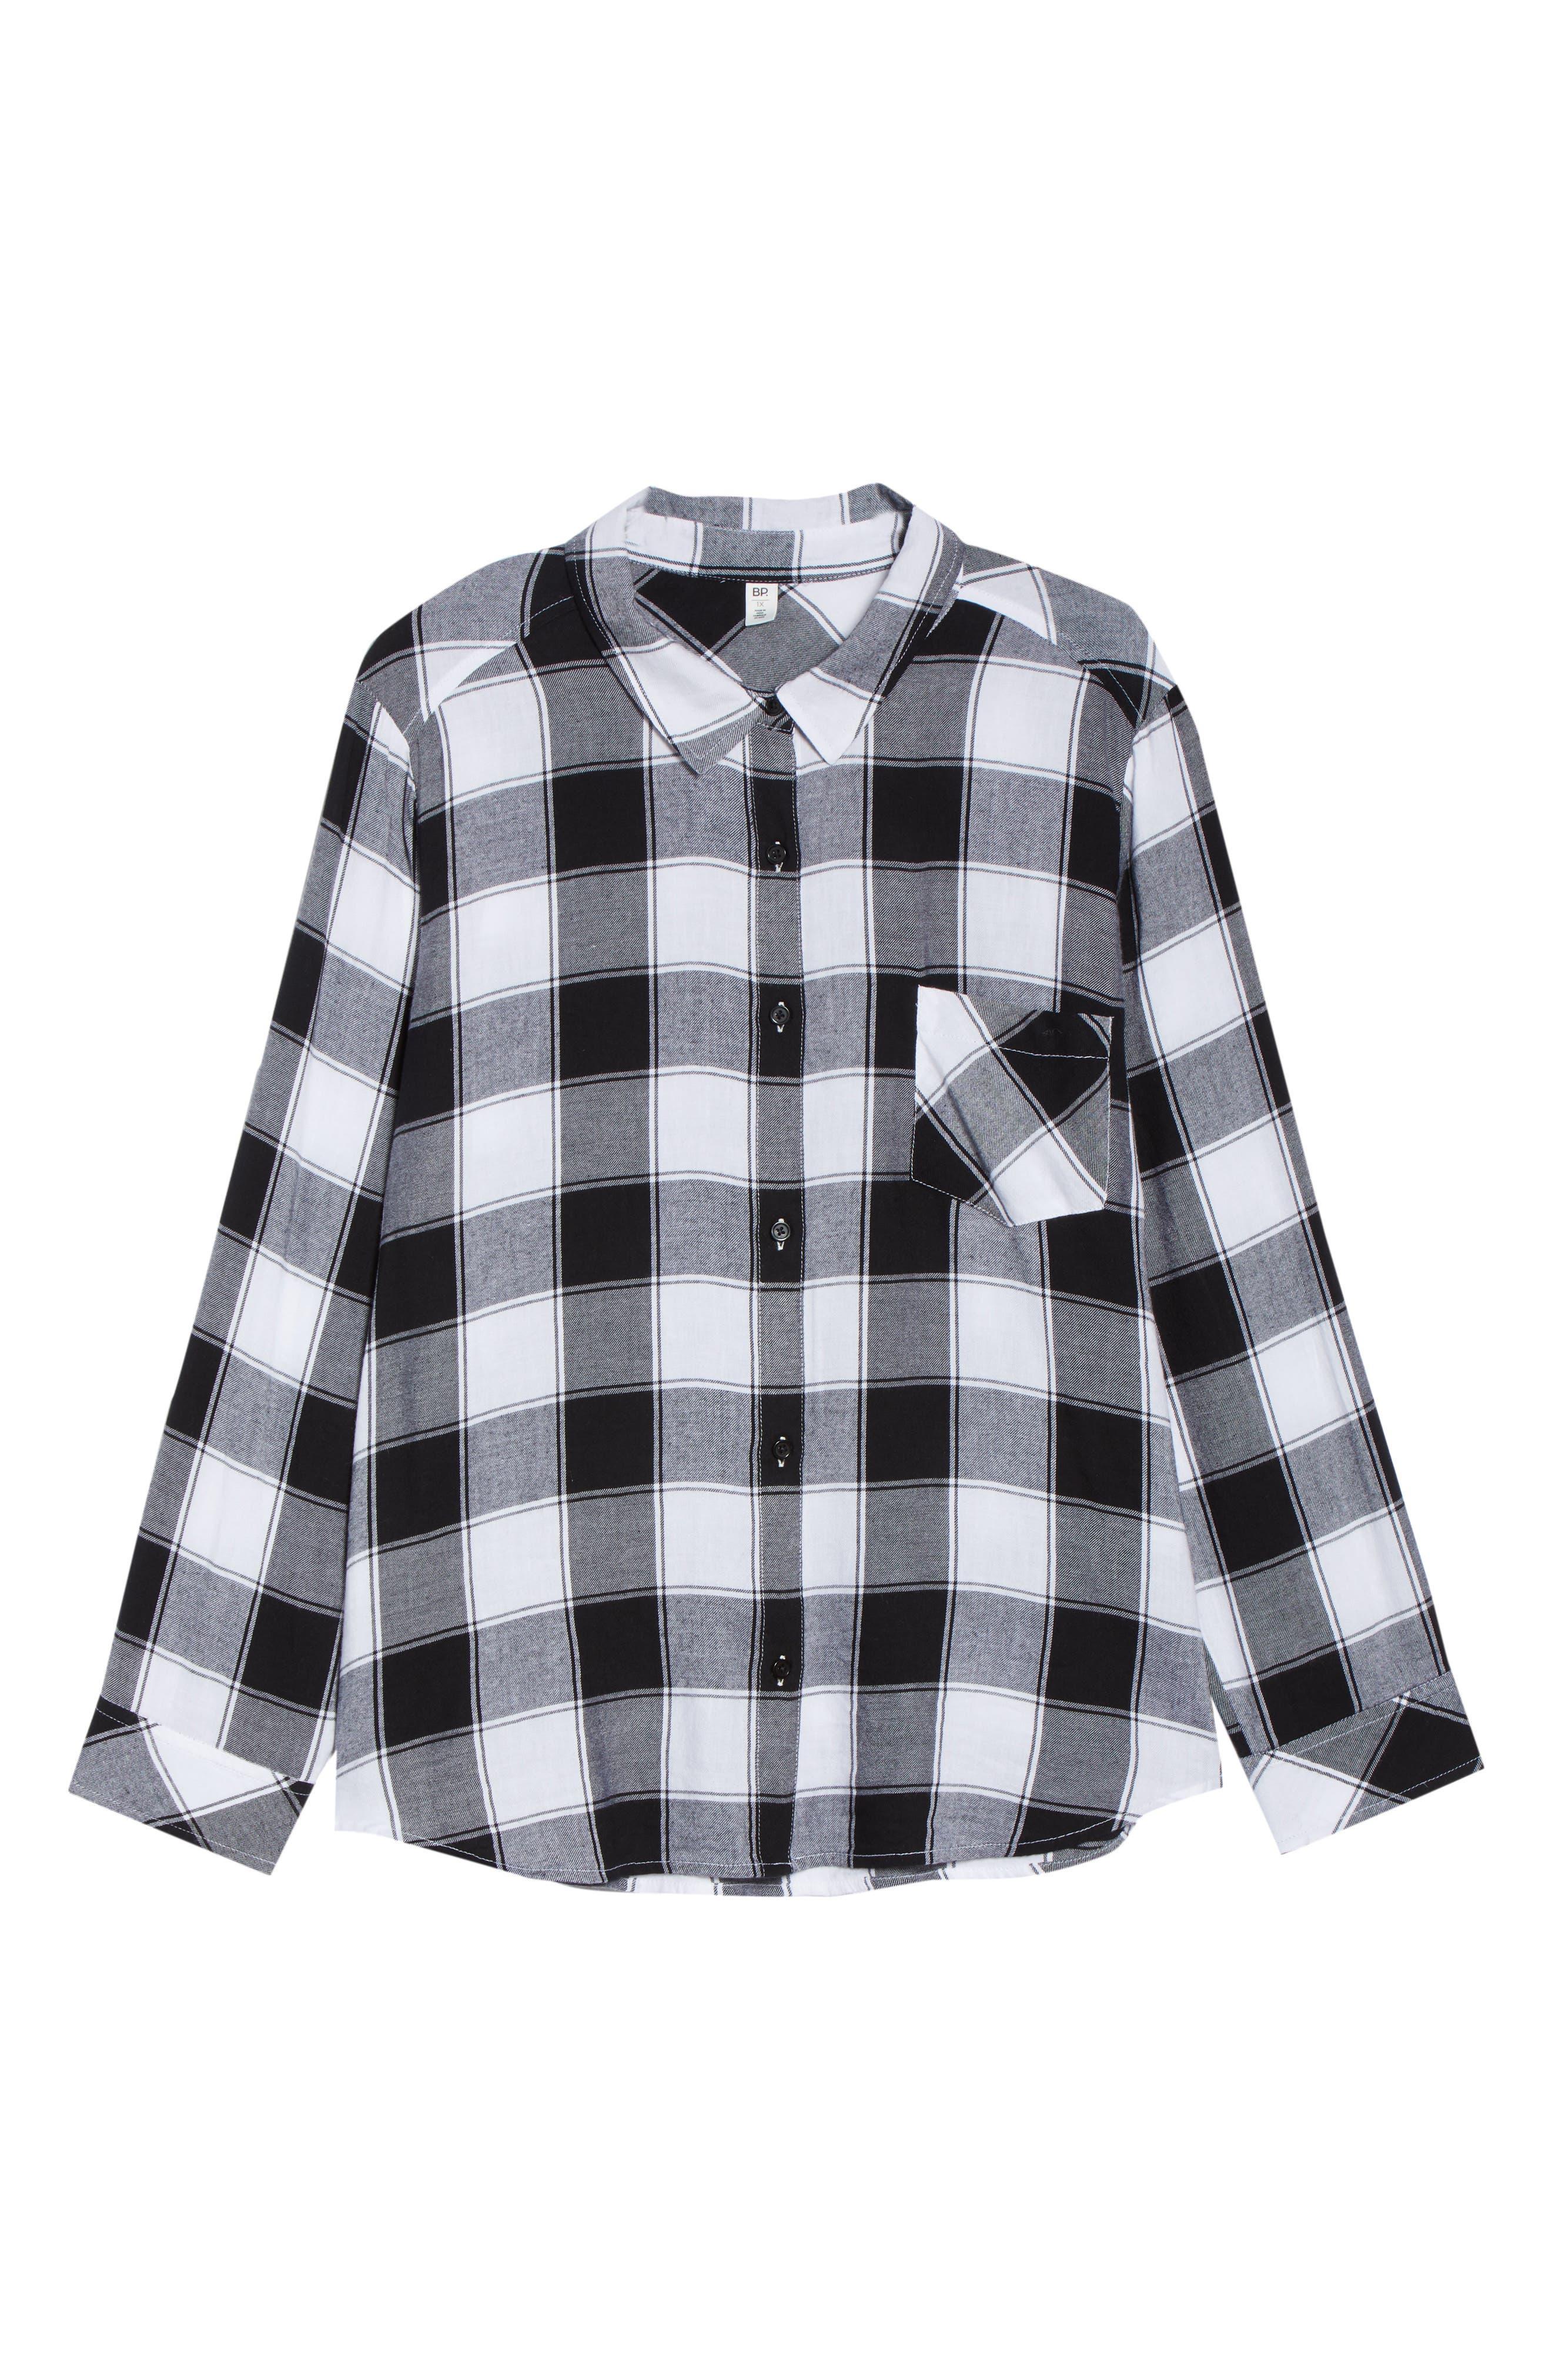 Plaid Shirt,                             Alternate thumbnail 6, color,                             BLACK DALEY PLAID